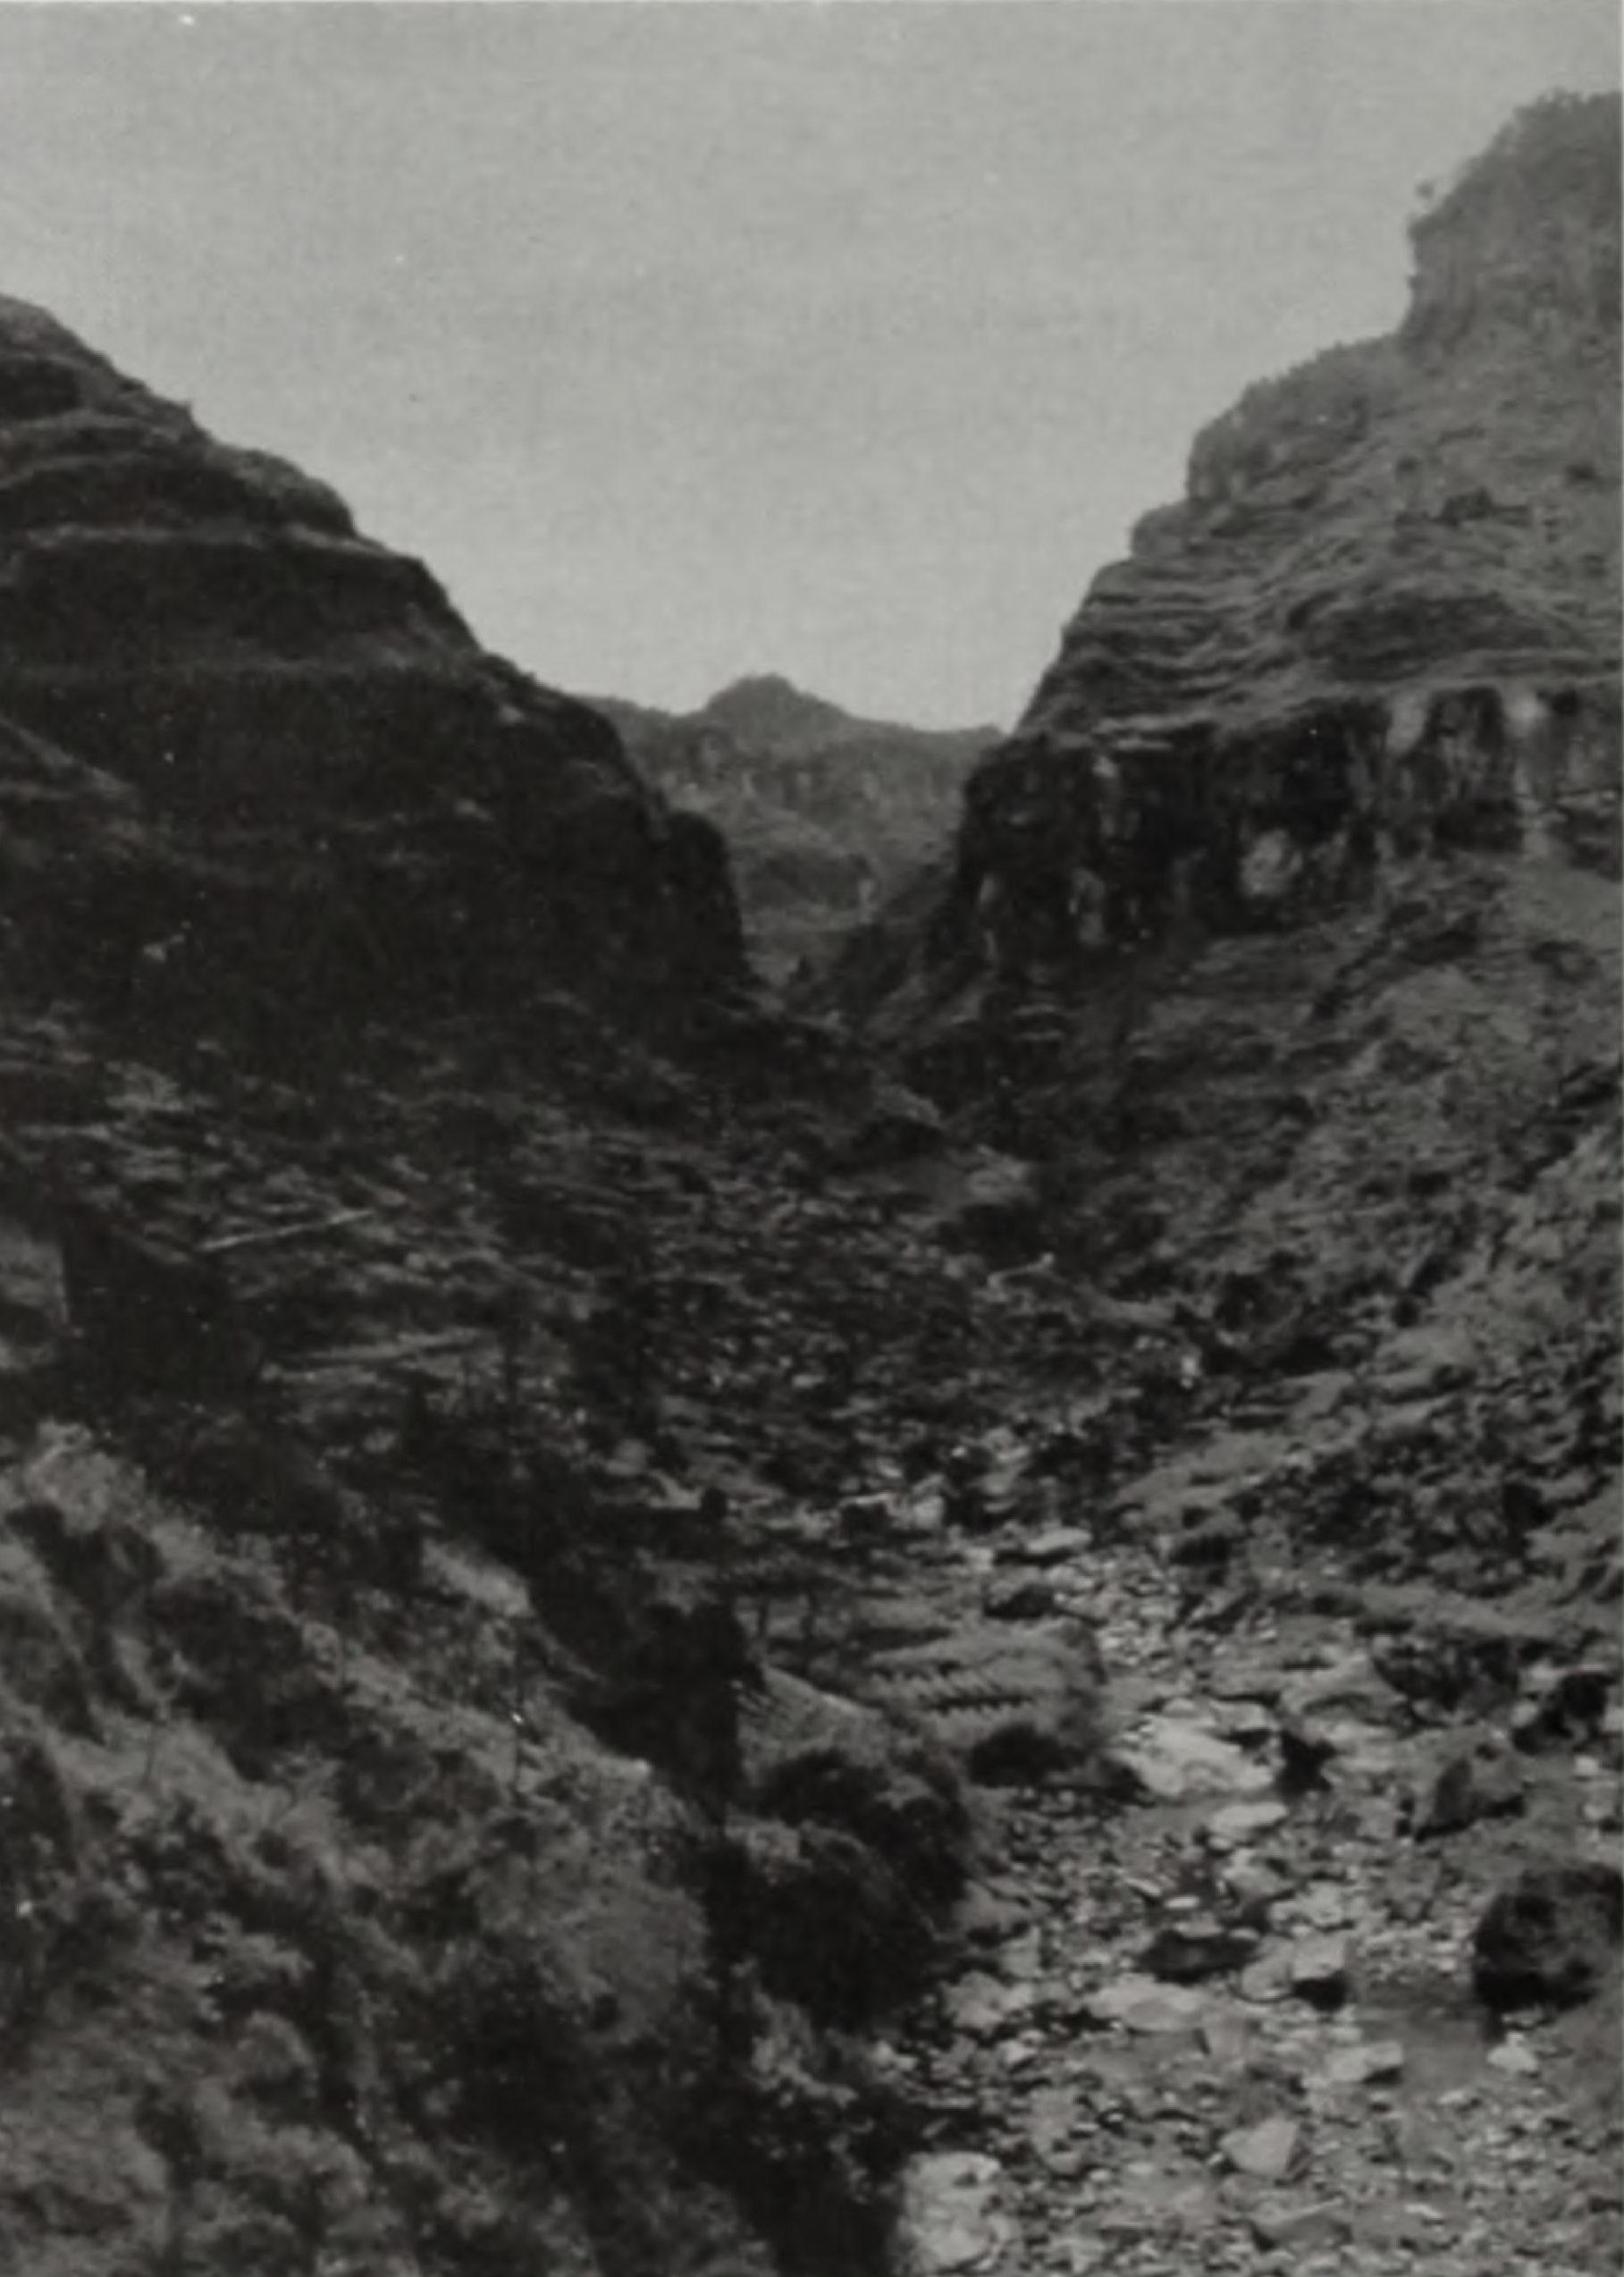 Blac-and-white landscape image of landscape